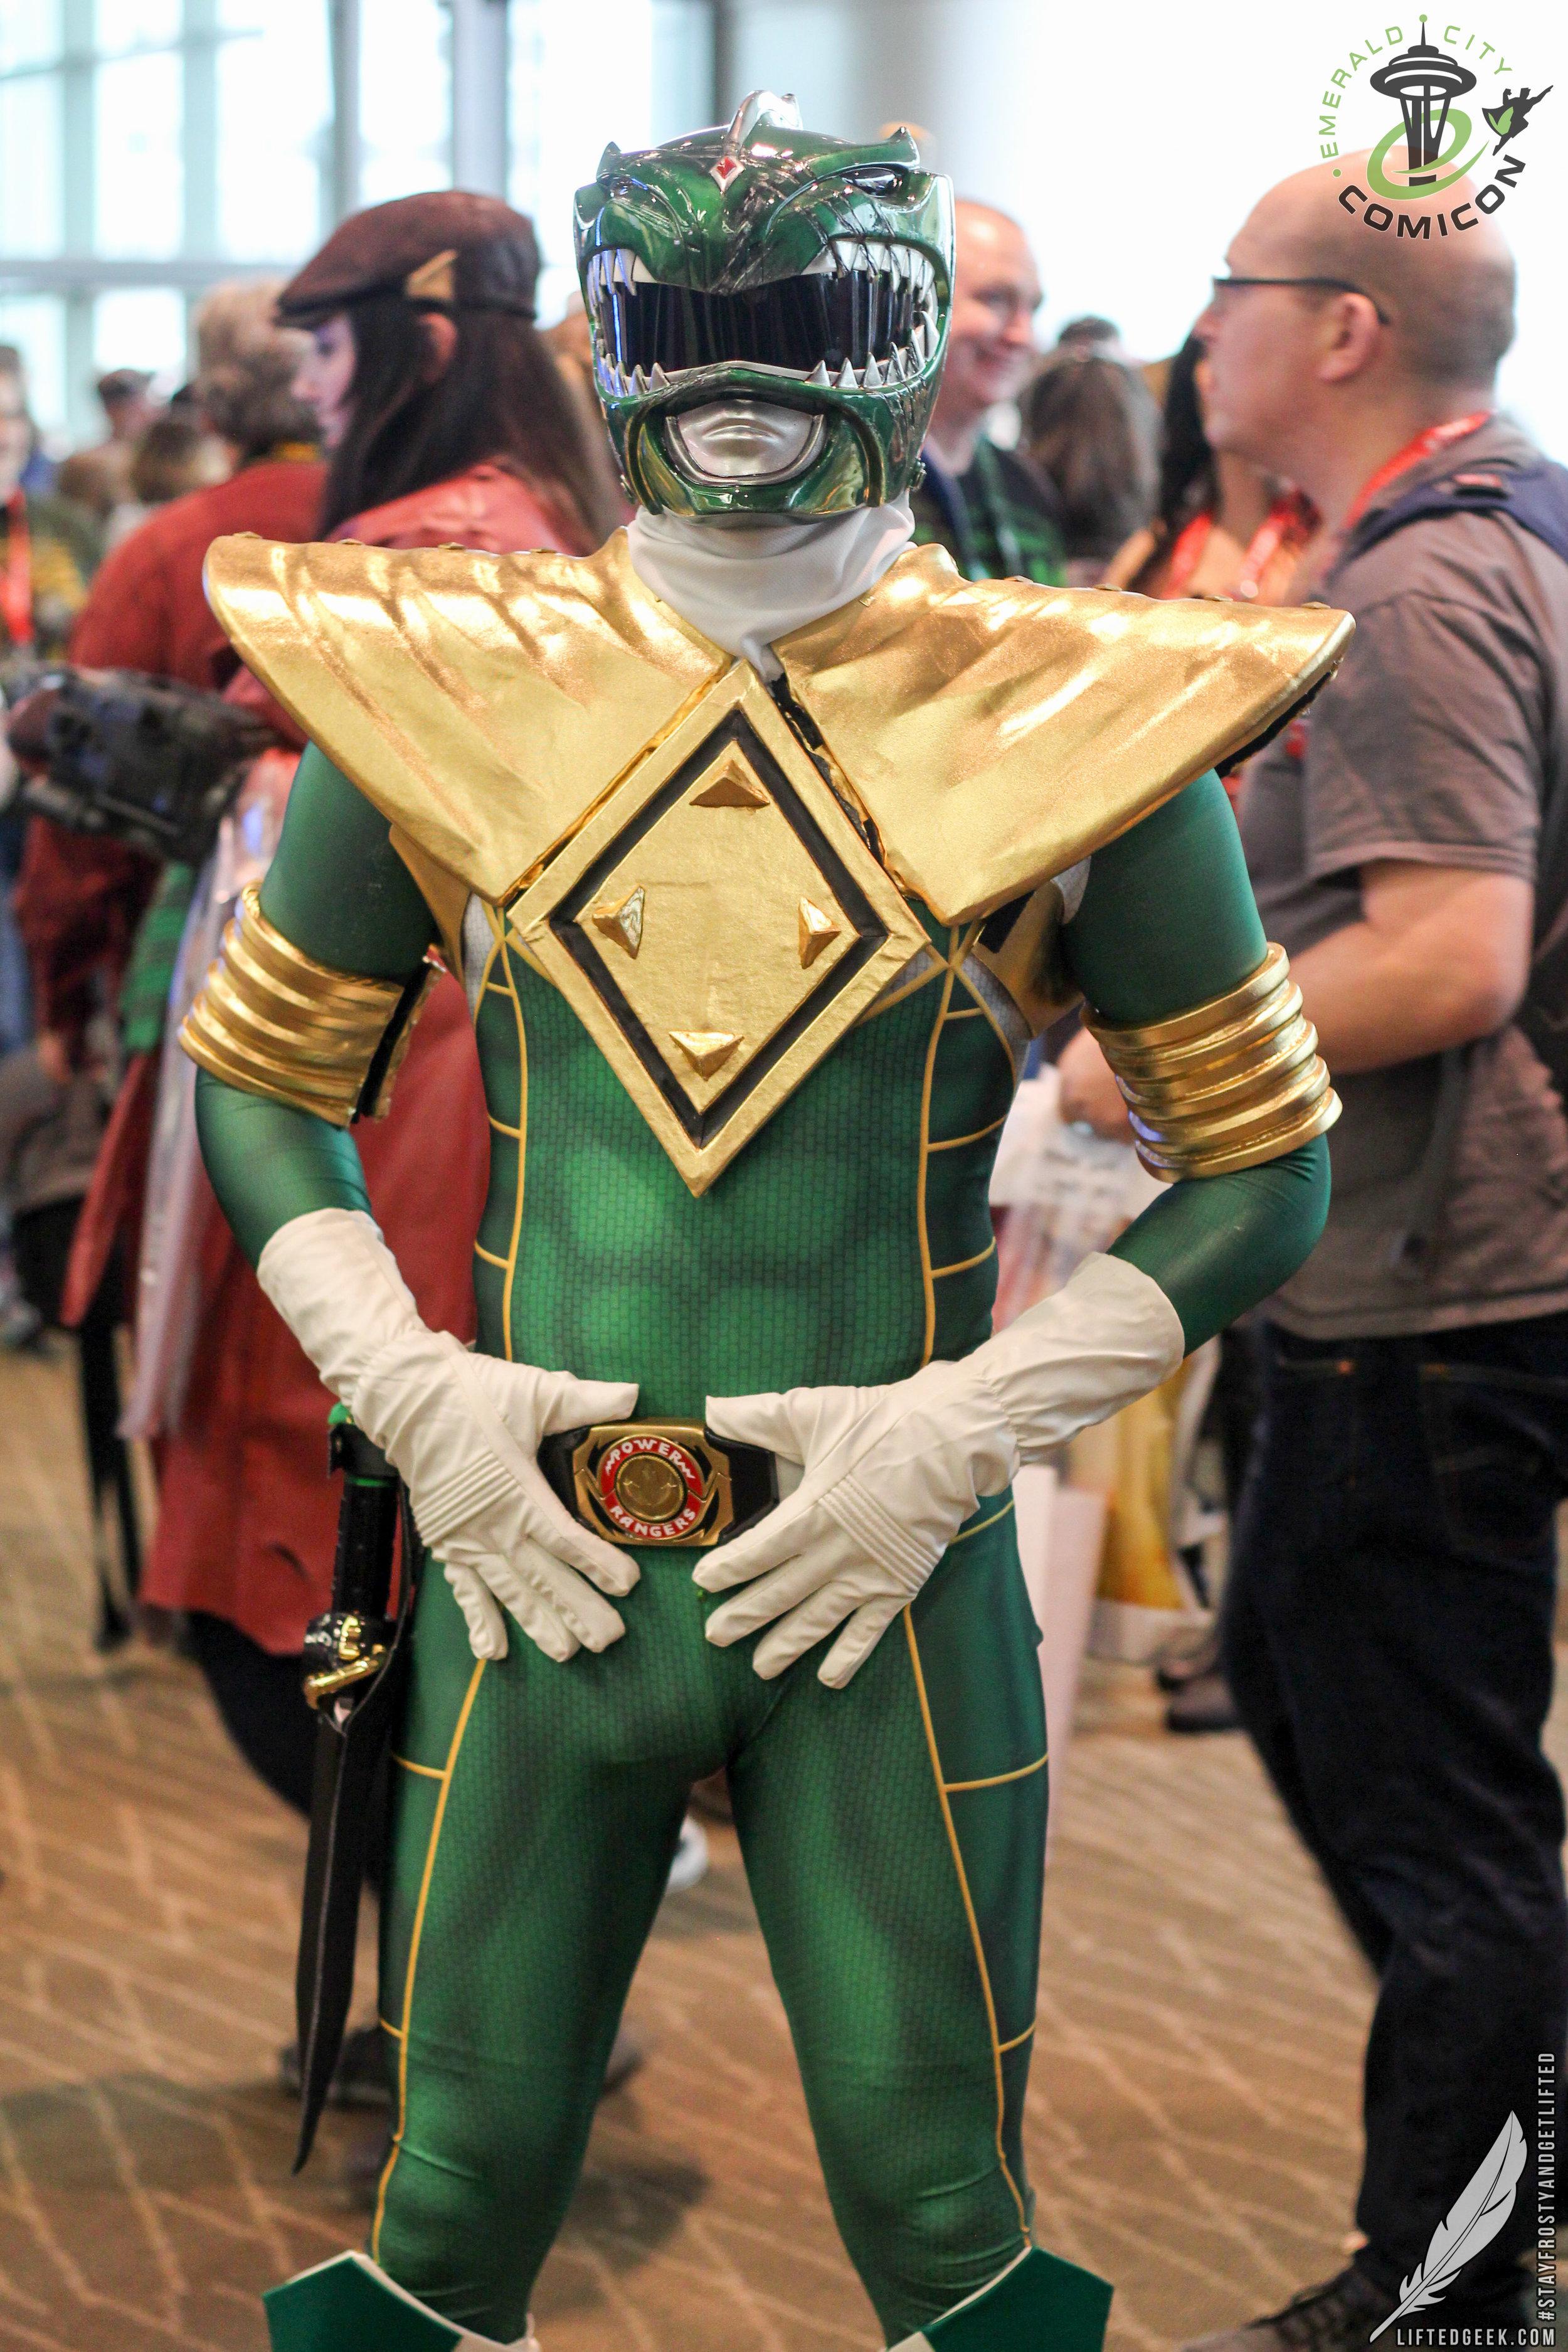 ECCC2018-cosplay-178.jpg